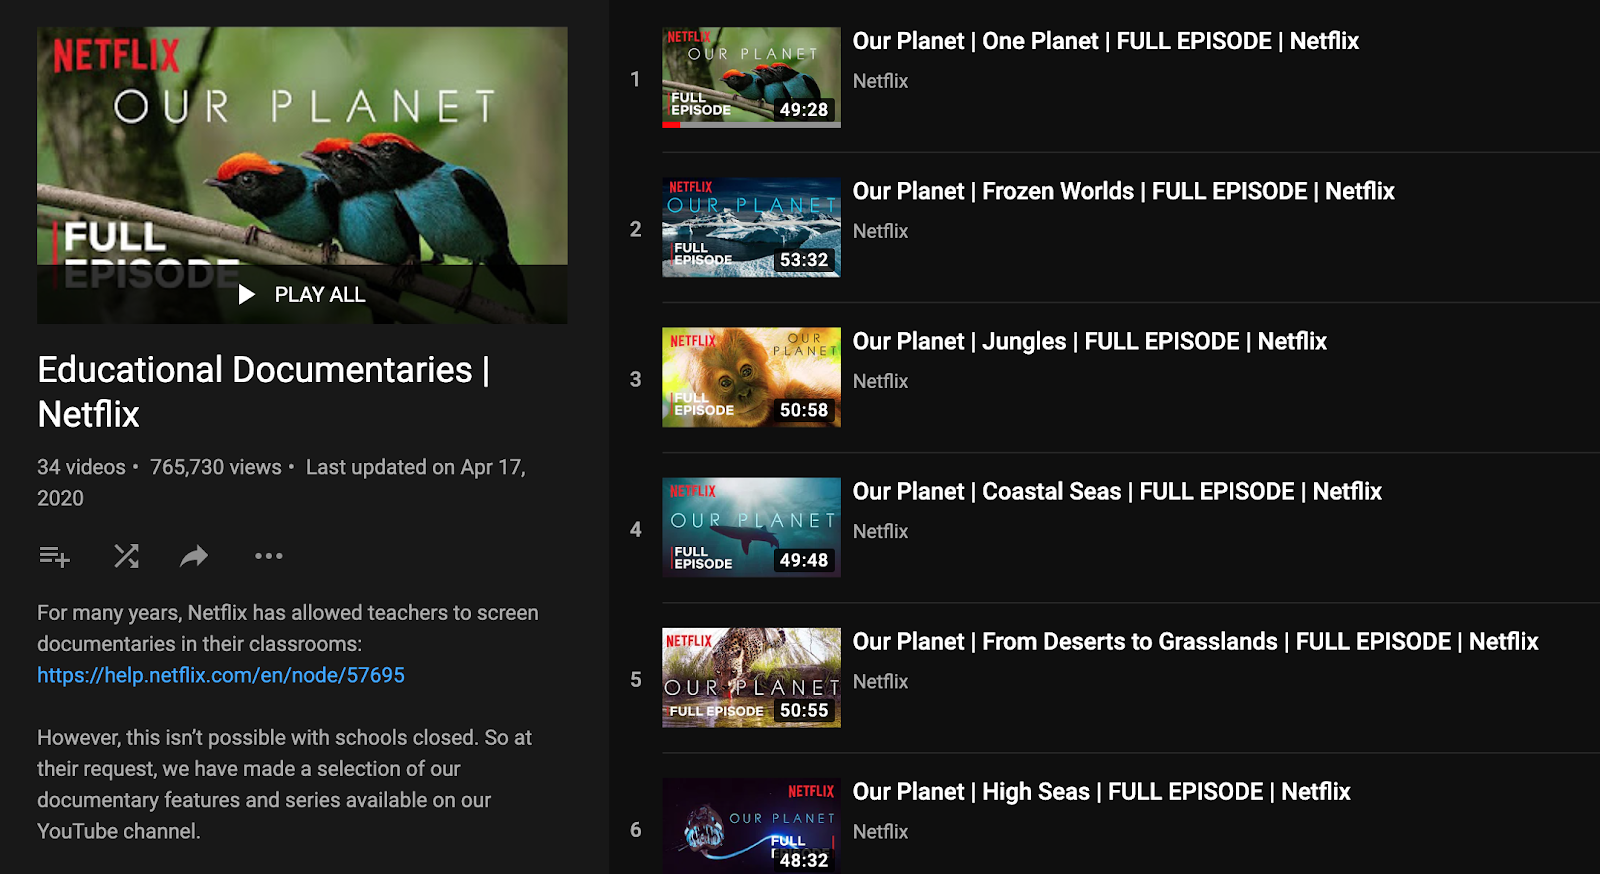 Netflix educational documentaries